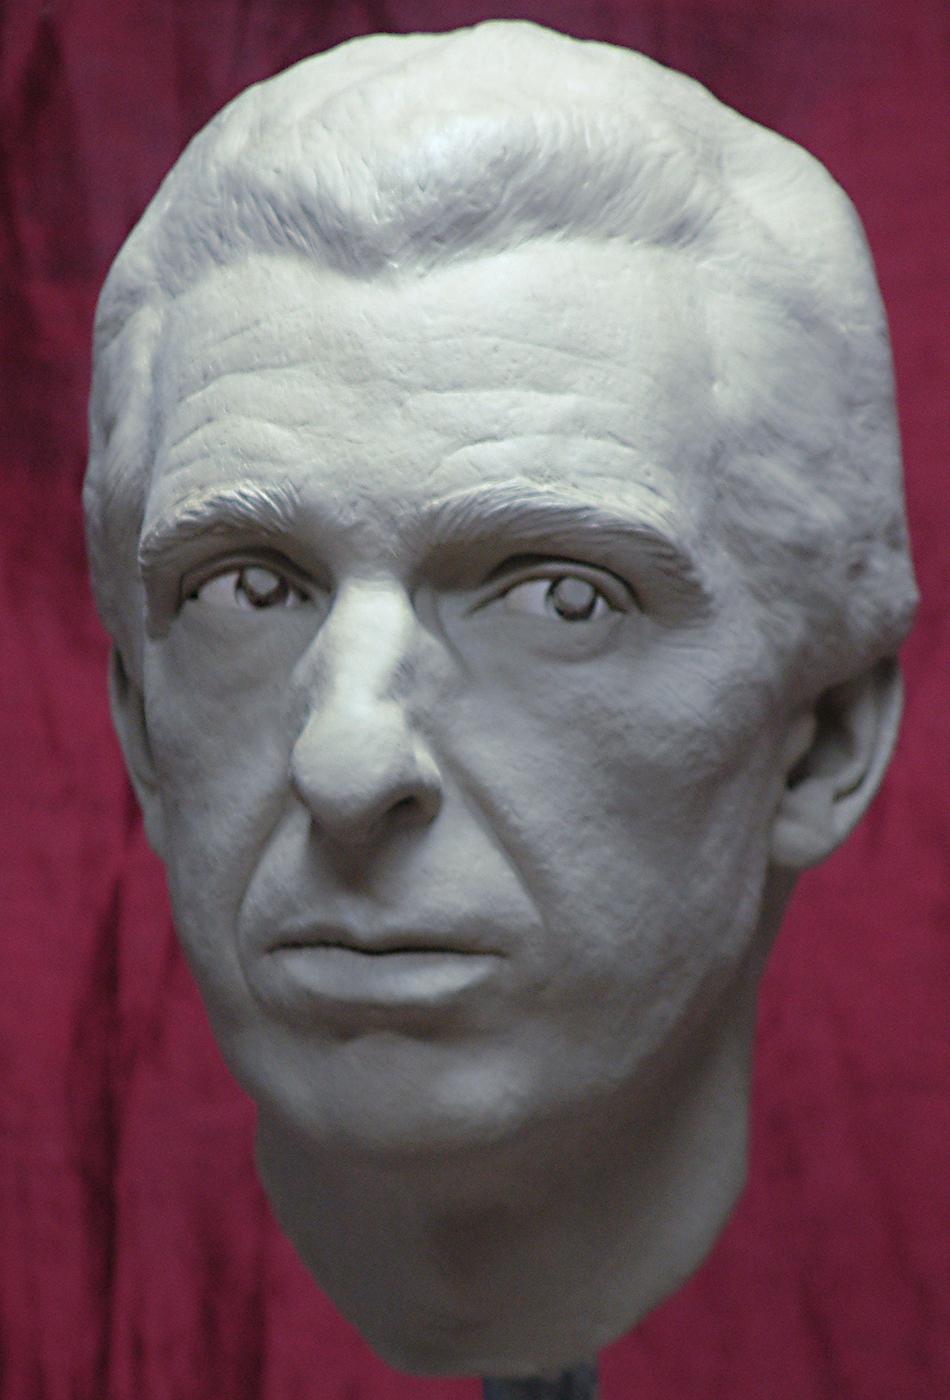 Portrait sculptor Michael Shanti